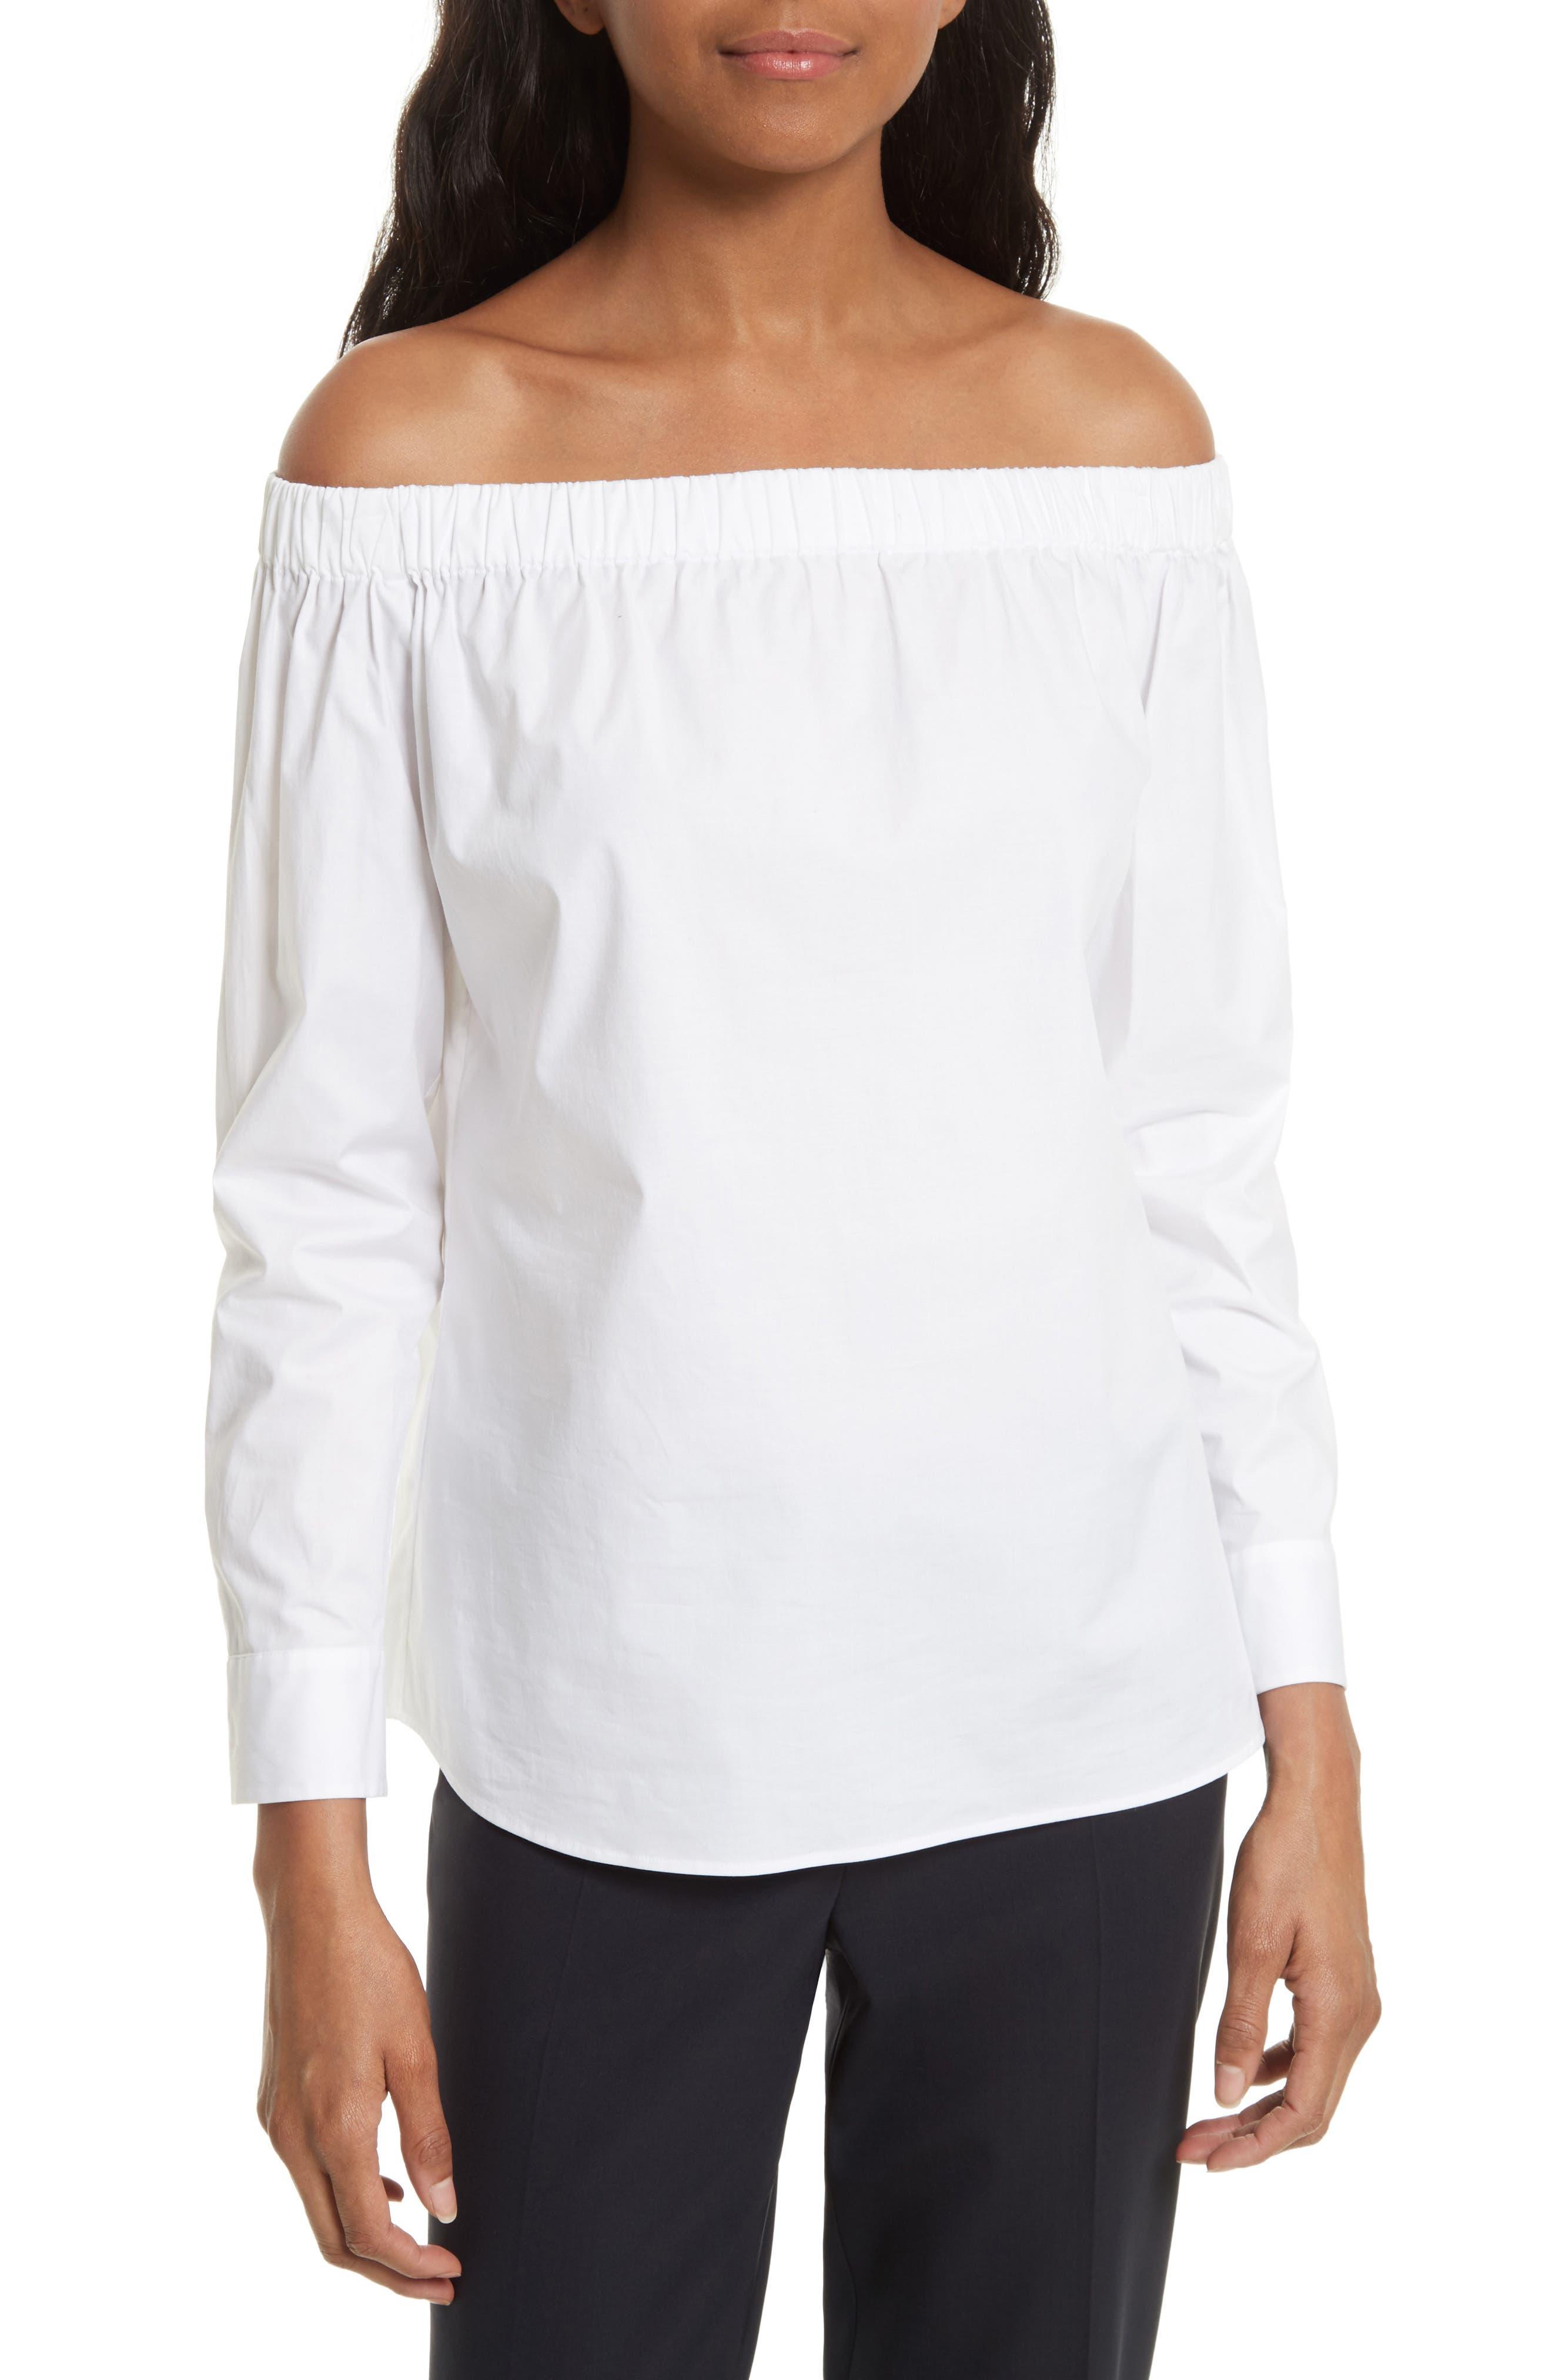 Bagiana Off the Shoulder Blouse,                         Main,                         color, 100